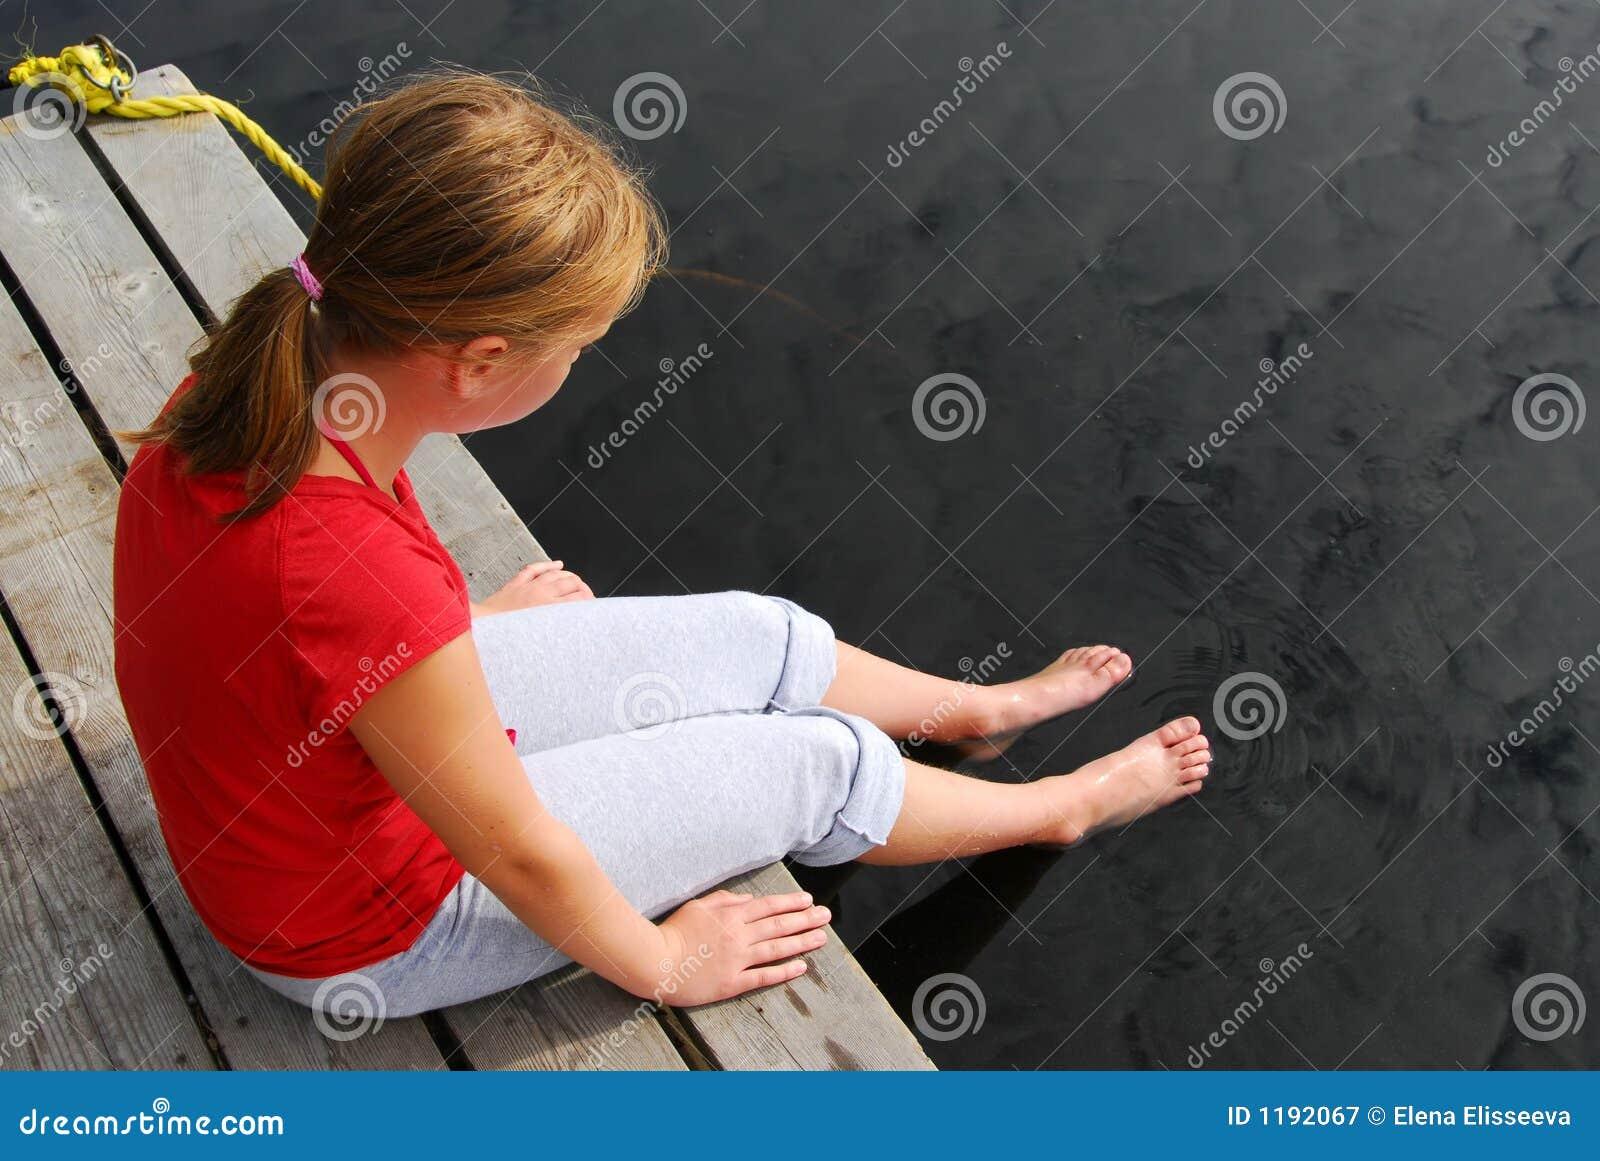 девушка стыковки ребенка